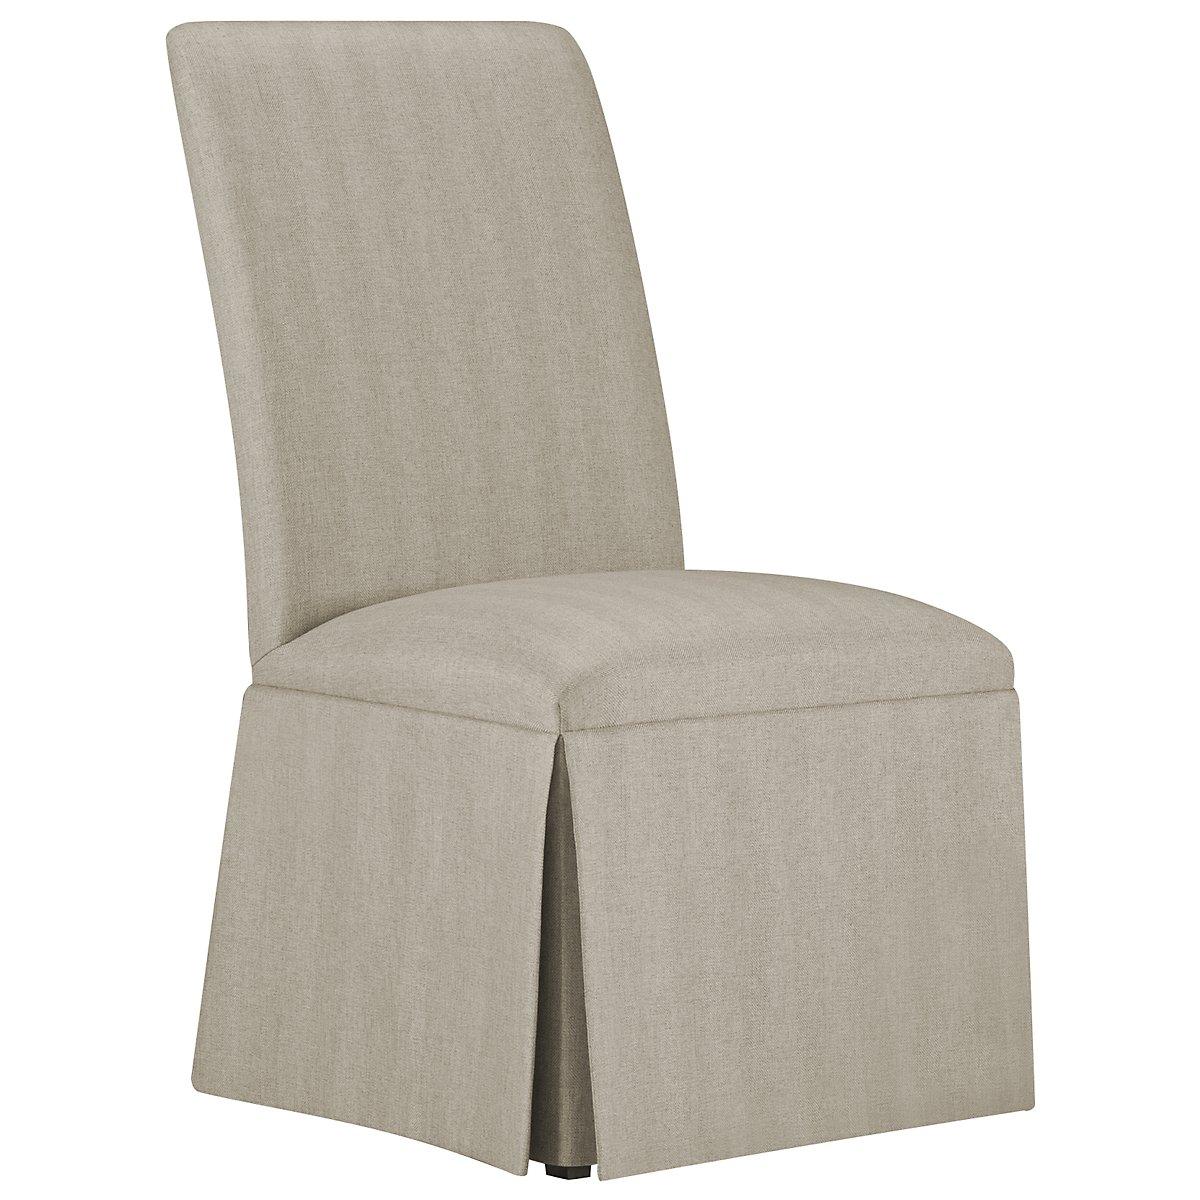 Barnsley Light Taupe Upholstered Upholstered Side Chair